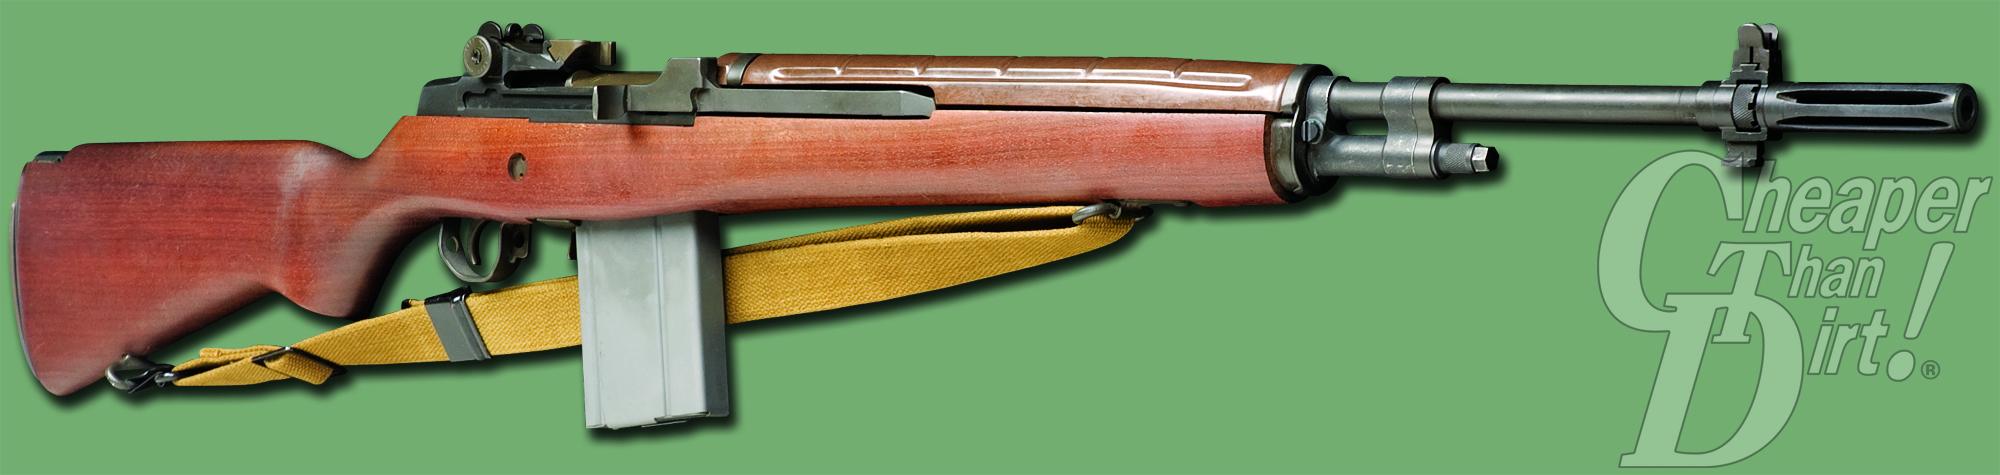 M21 Gun